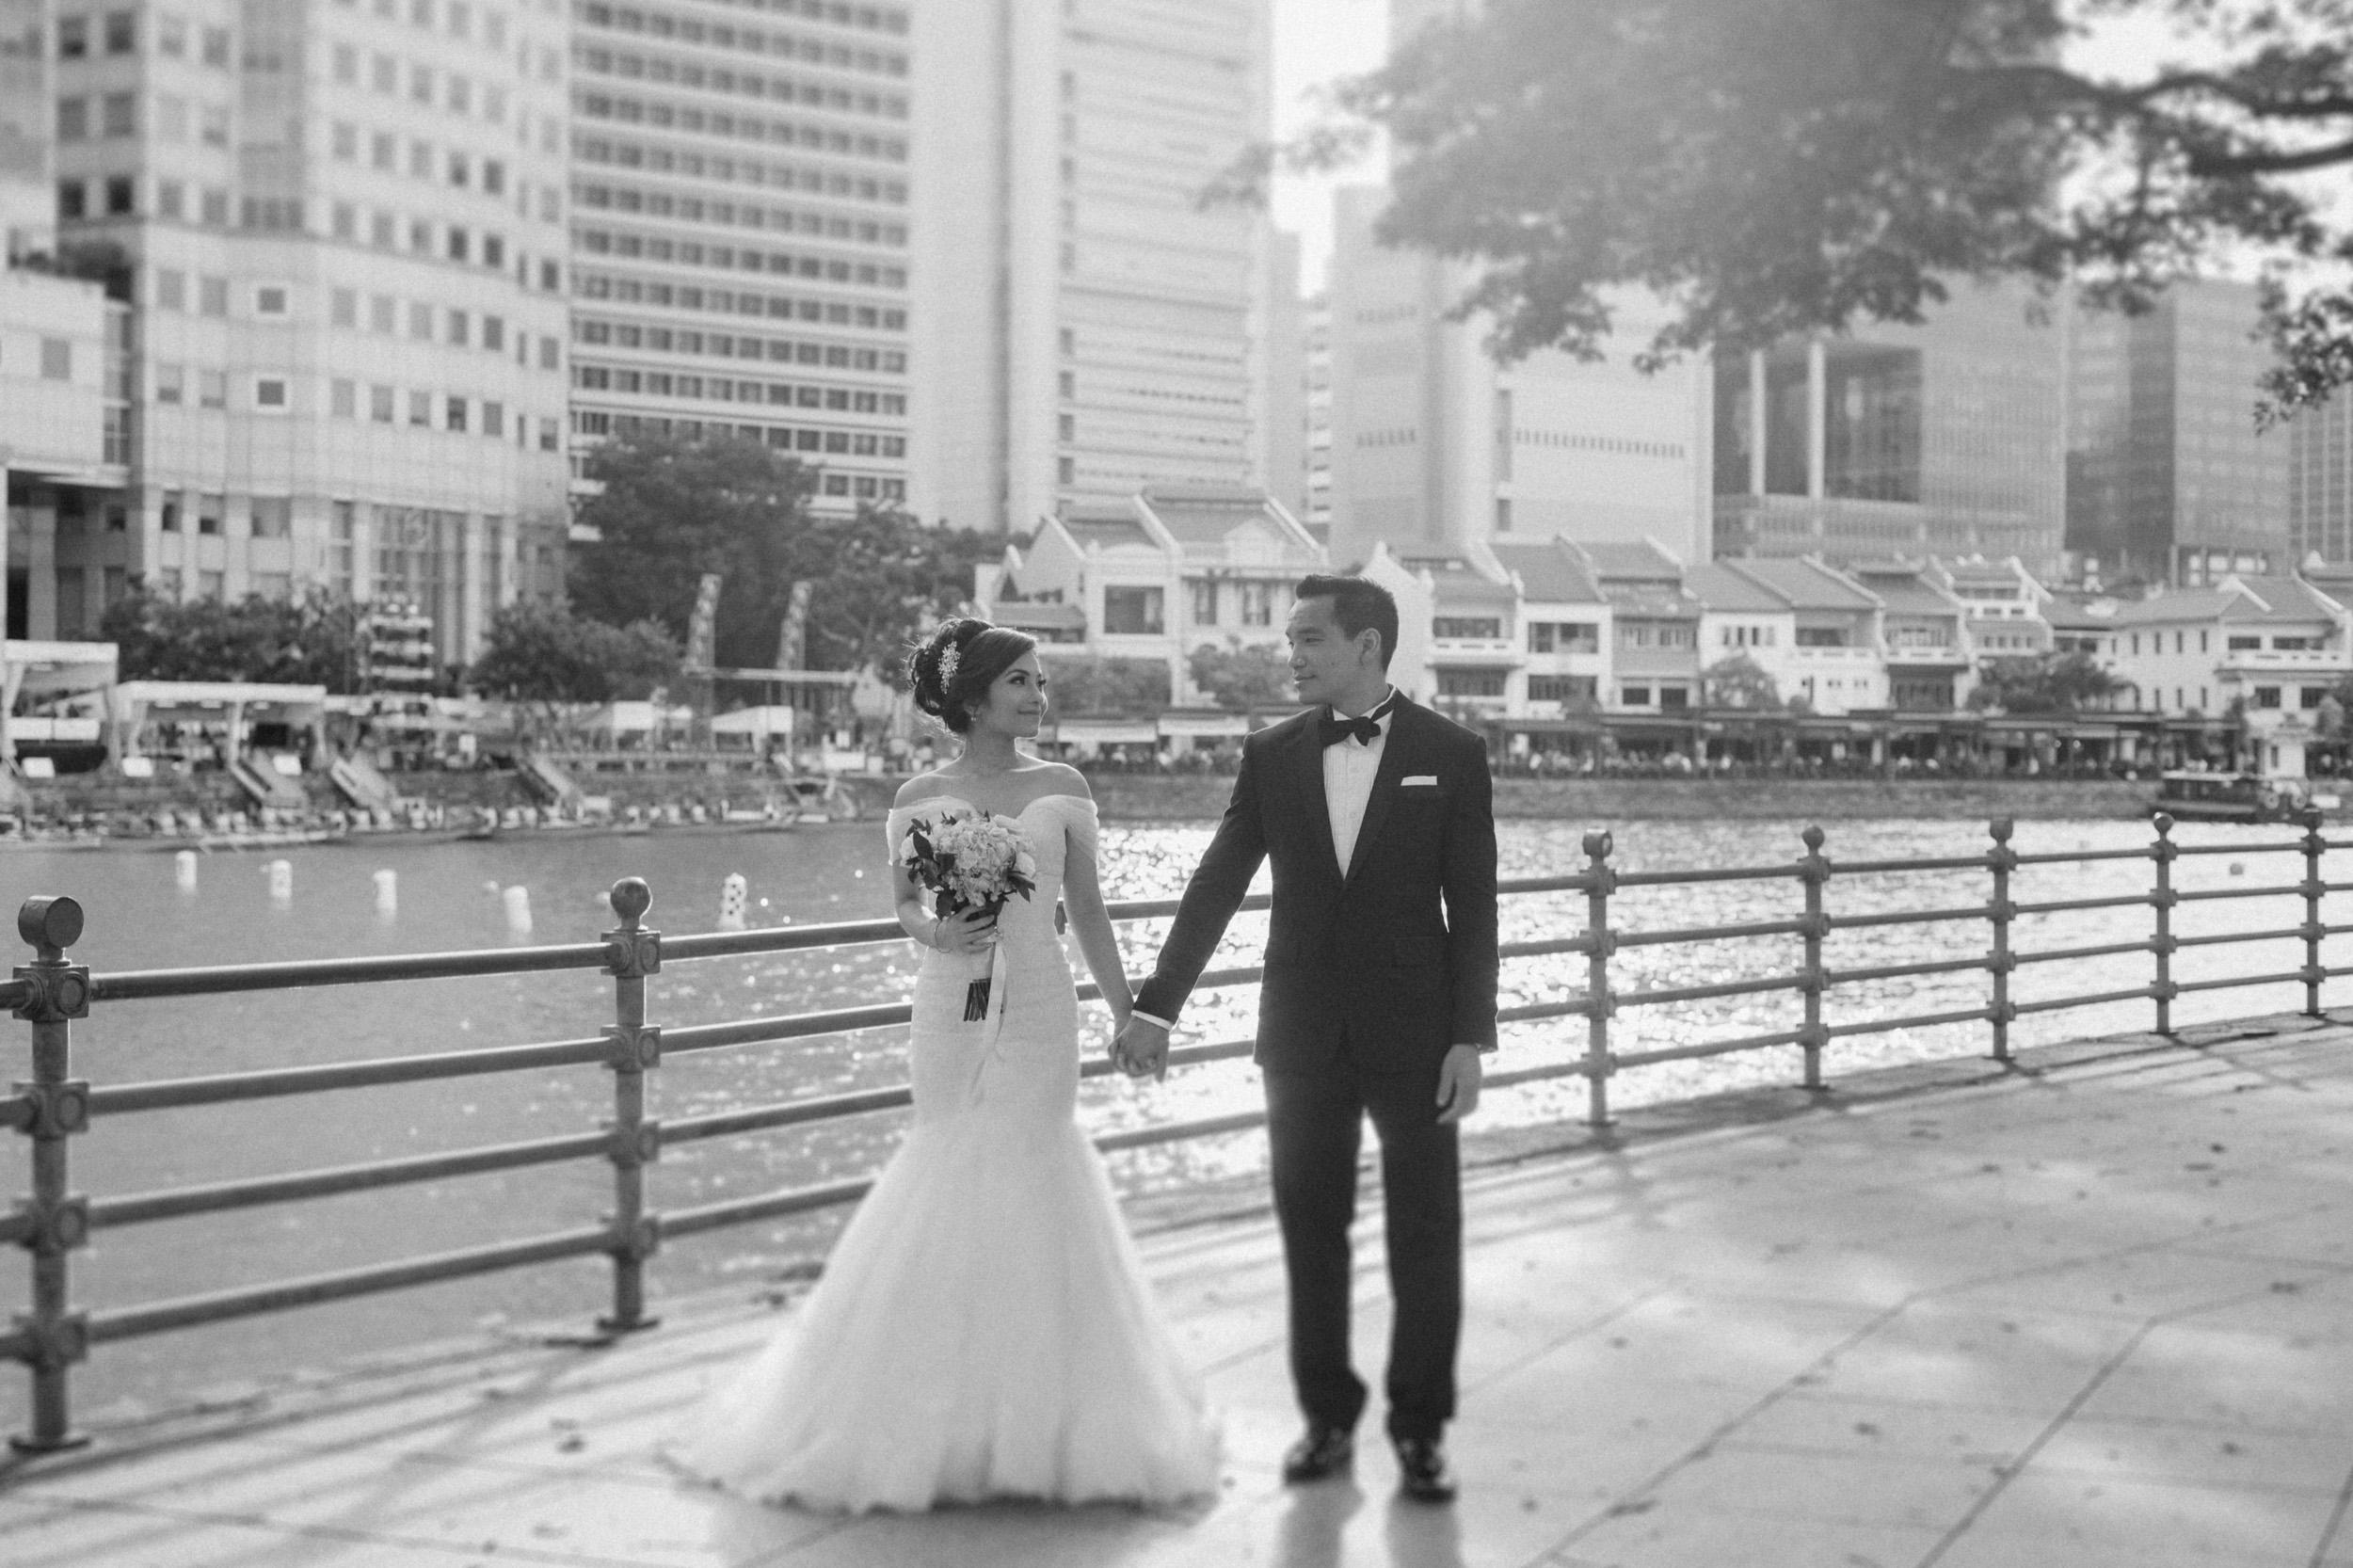 singapore-wedding-photographer-photography-wmt2017-103.jpg